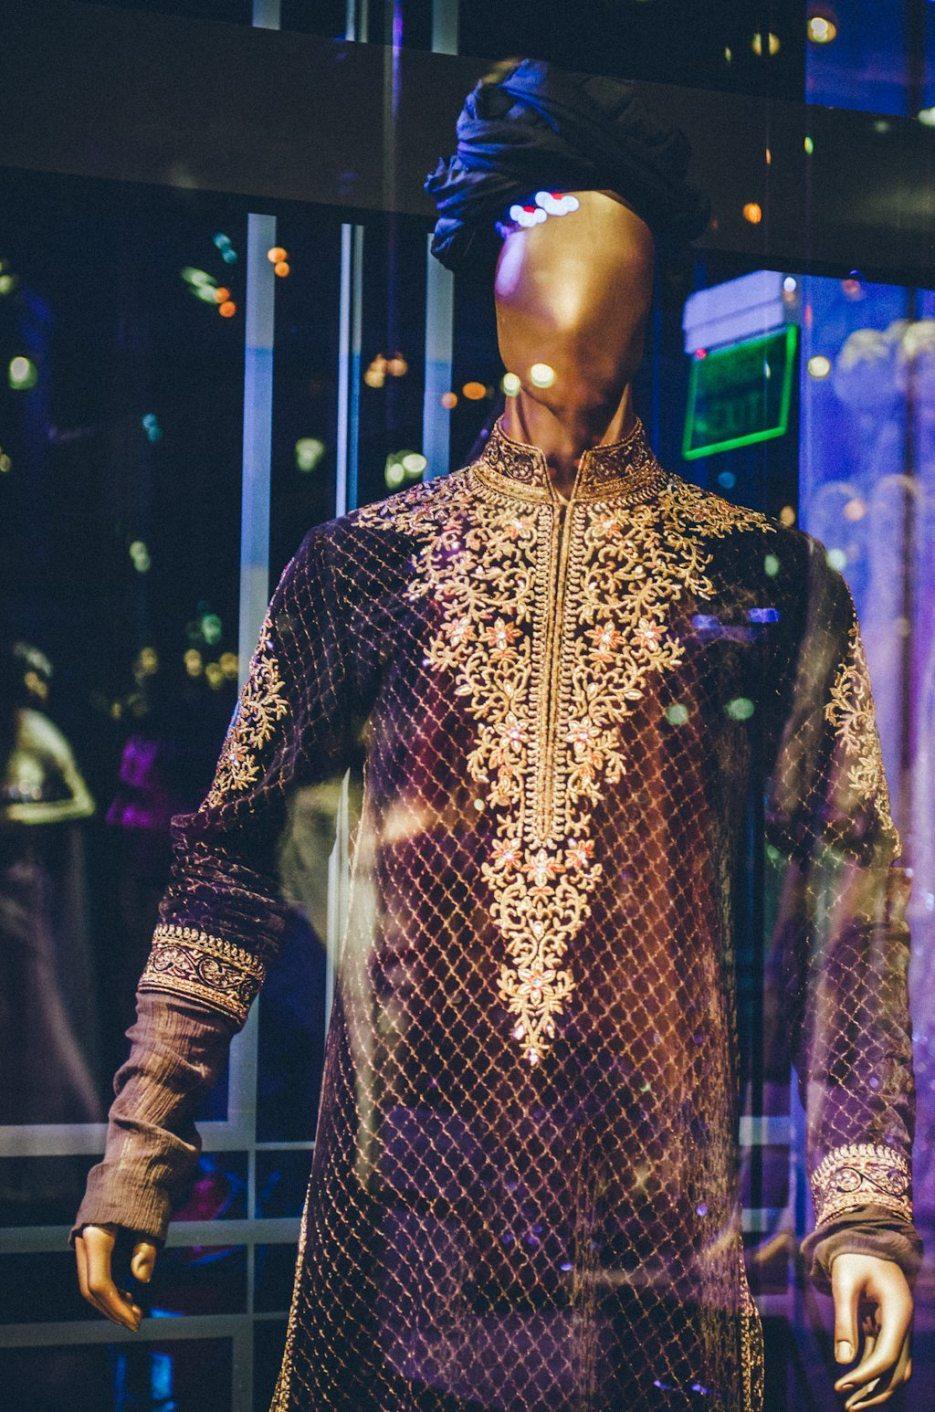 Tarun-Tahiliani-Bridal-Couture-Wedding-Wear-Fashion-Designer-Photographer-Naina-Knottytales-37.jpg